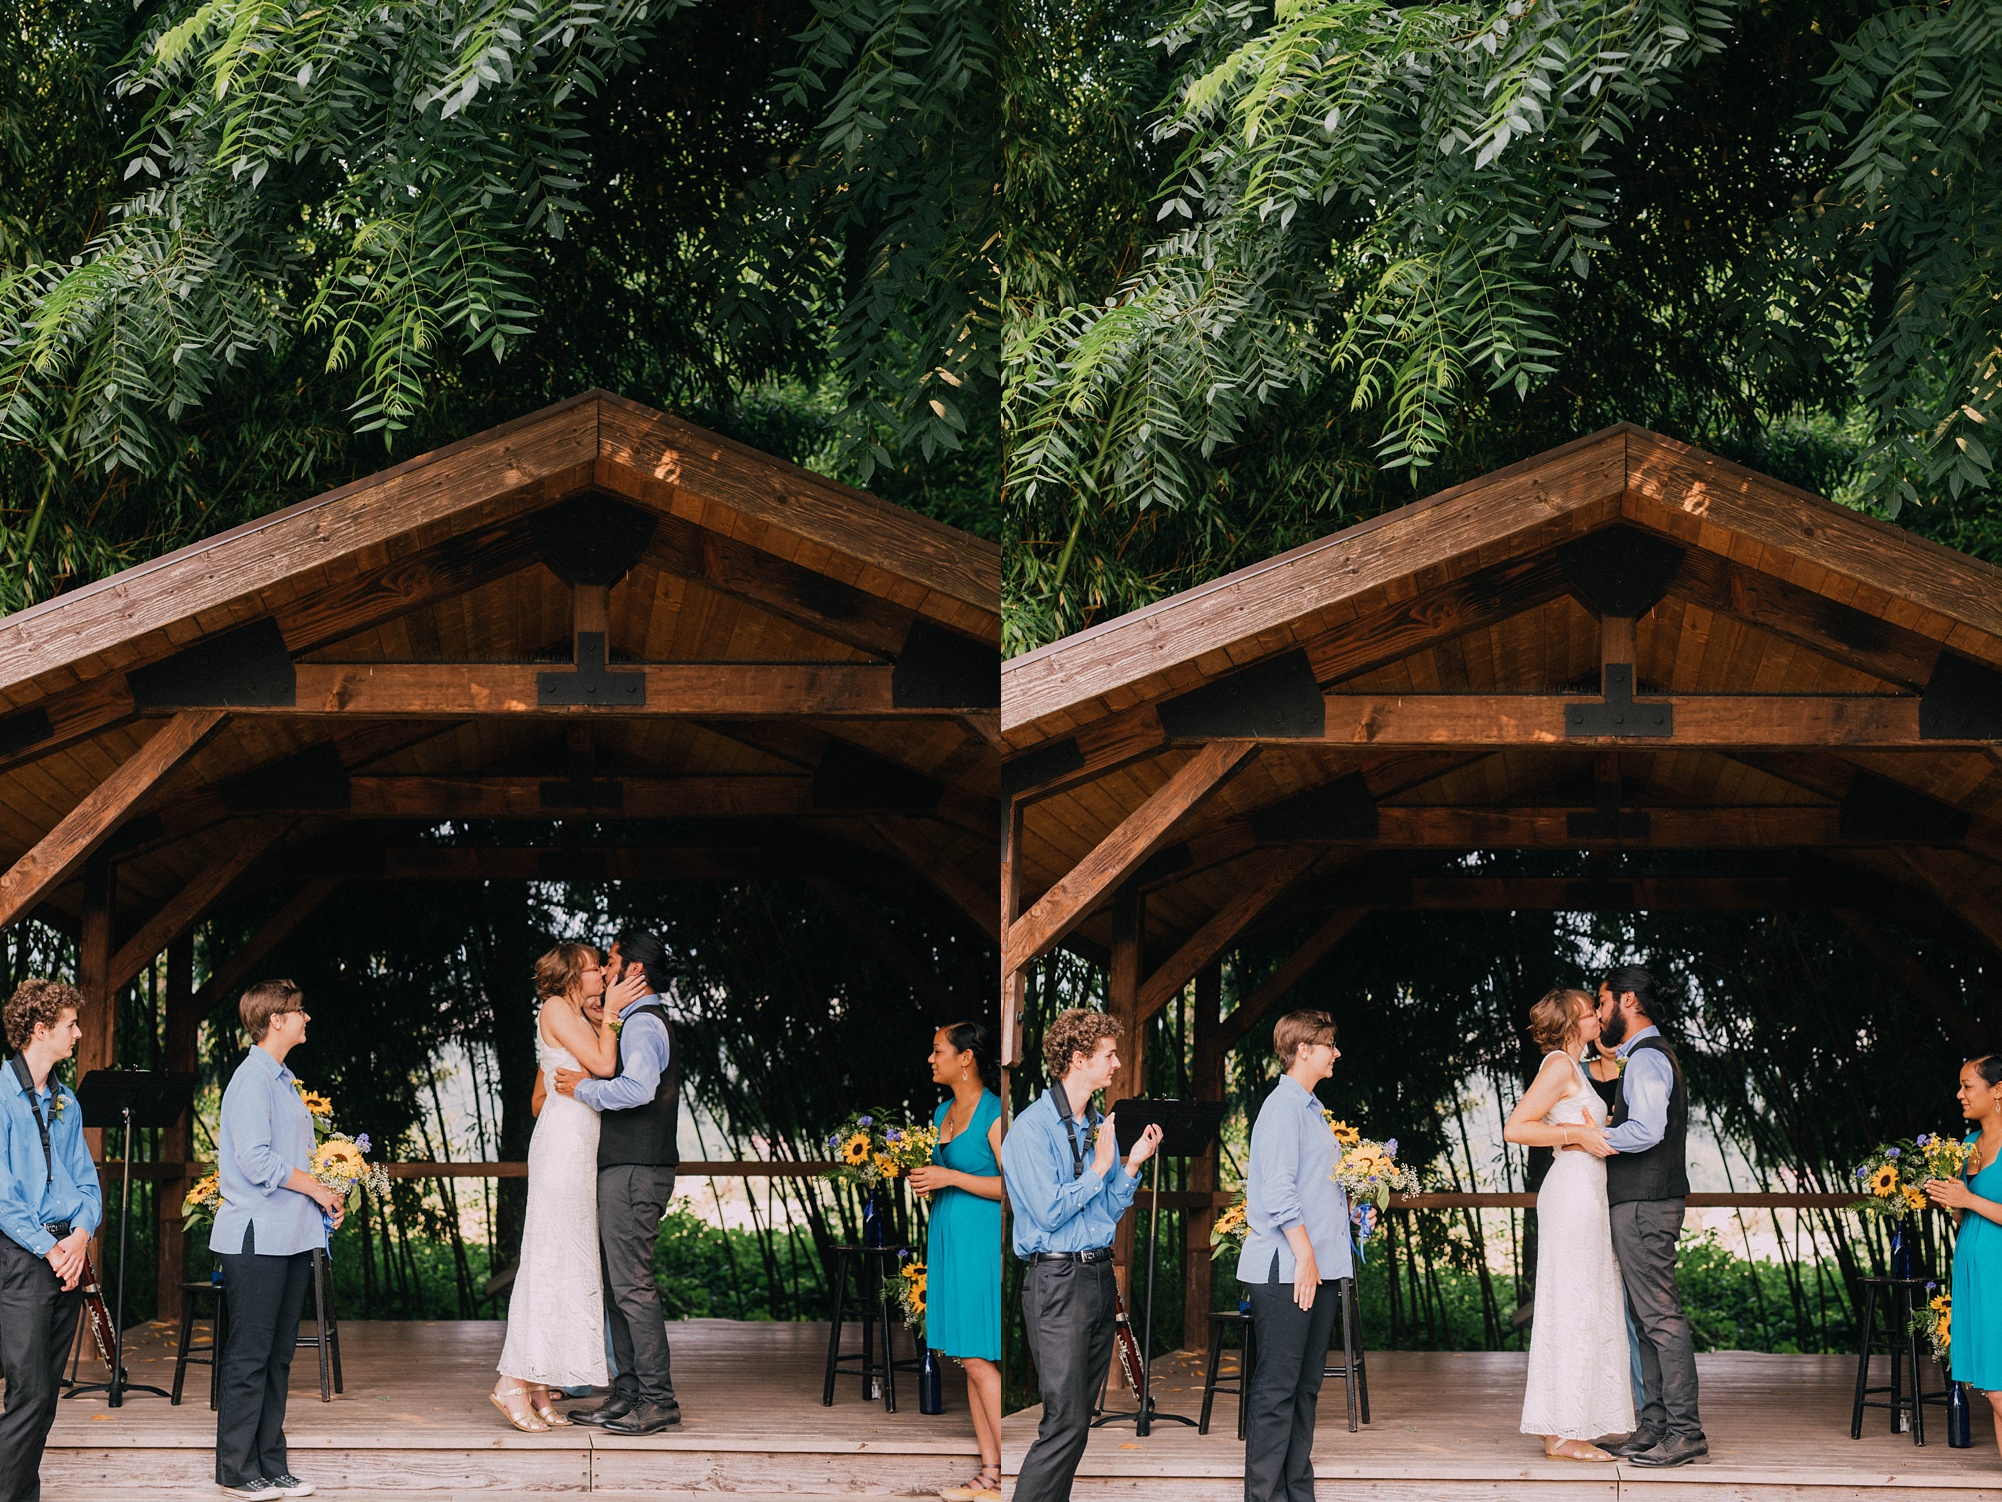 ashley_vos_seattle_ wedding_photographer_0465.jpg